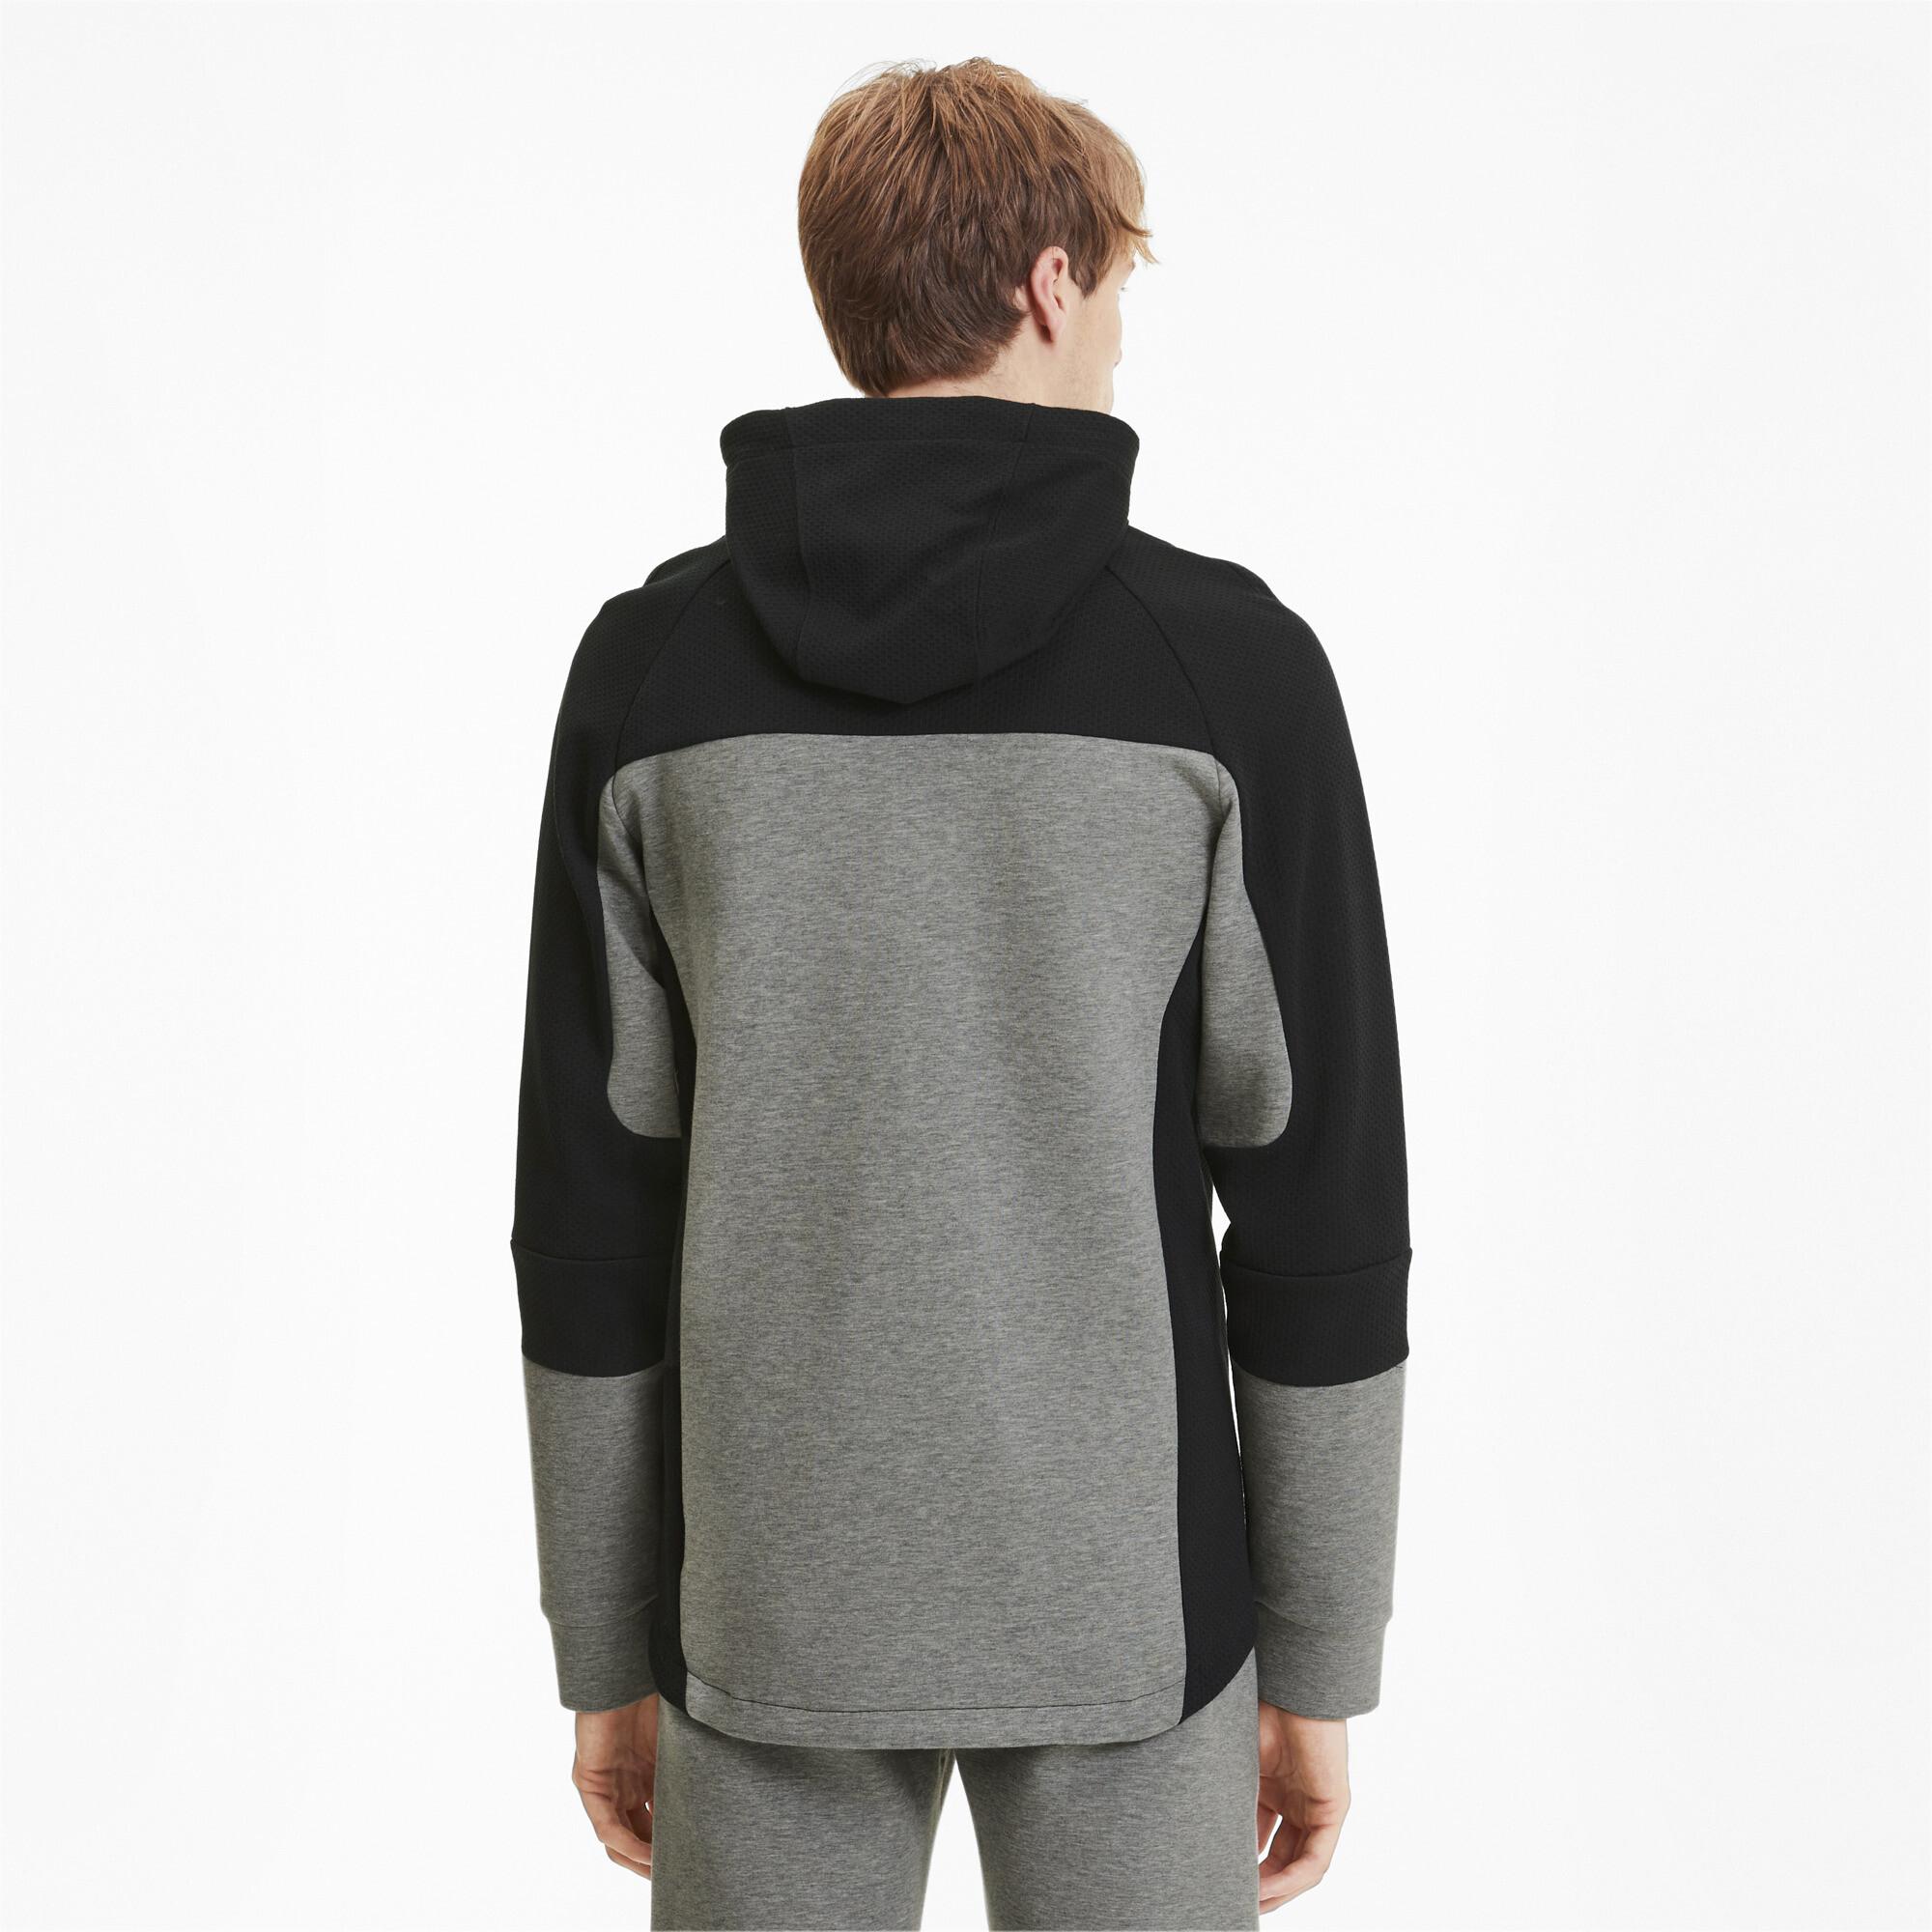 PUMA-Evostripe-Men-039-s-Hooded-Jacket-Men-Sweat-Basics thumbnail 20